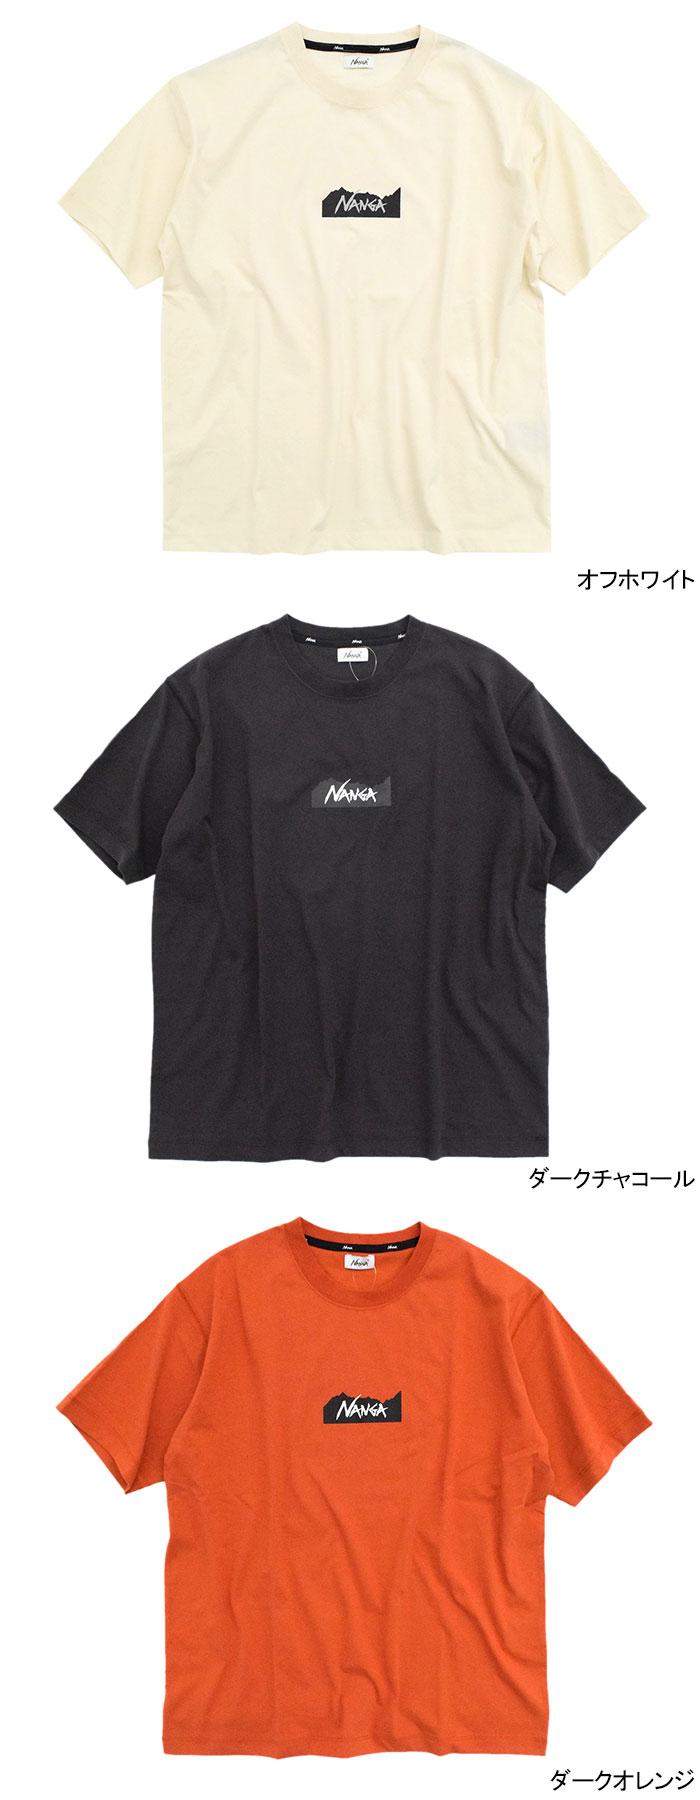 NANGAナンガのTシャツ Logo11